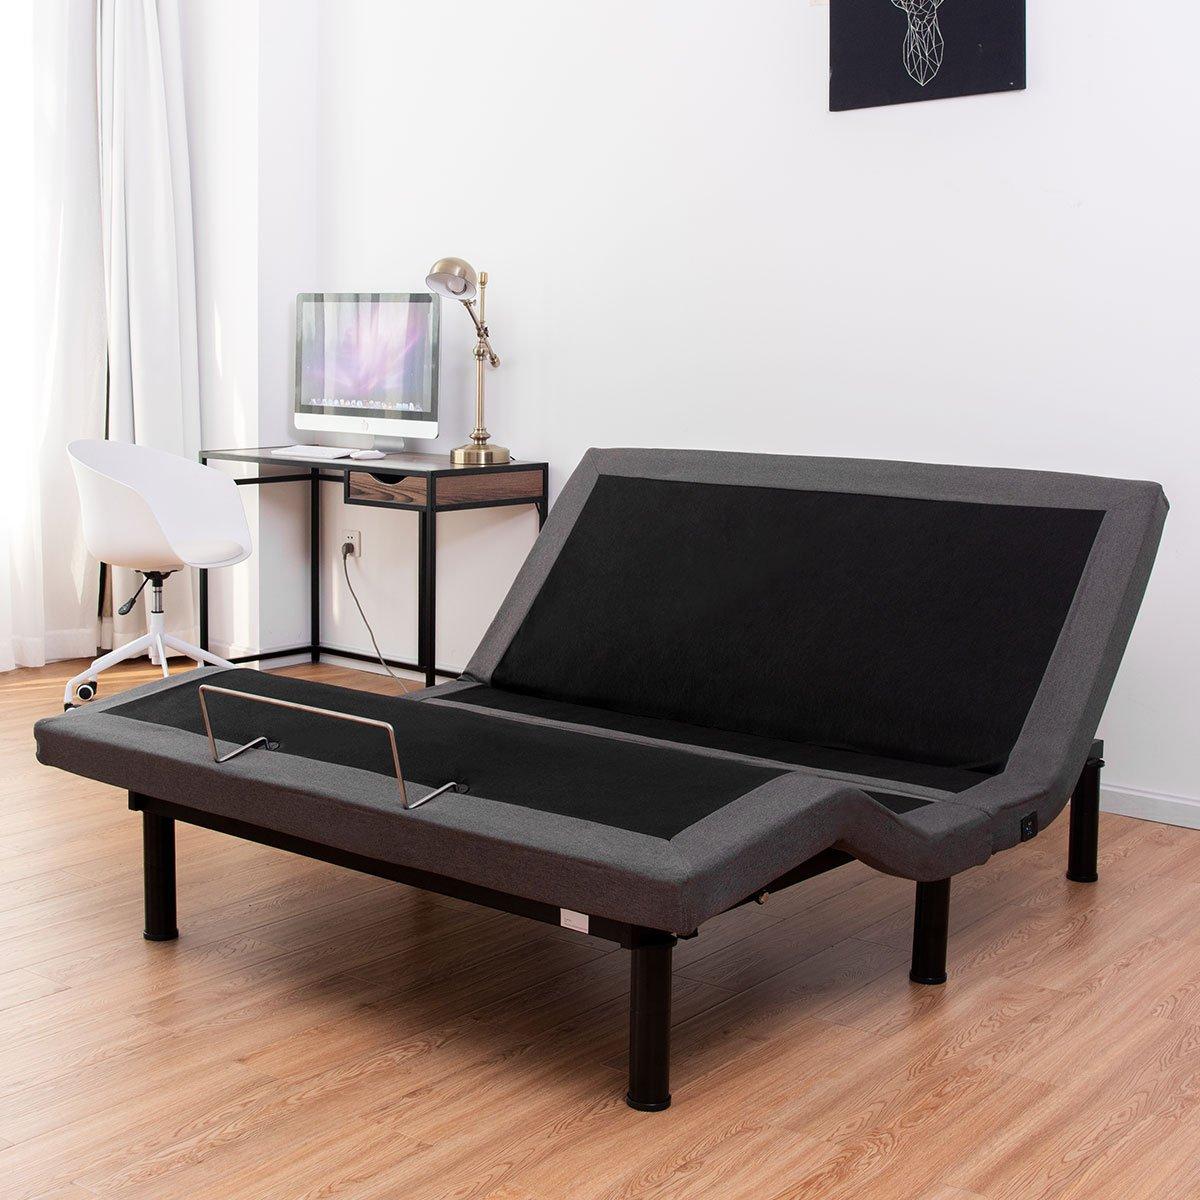 Giantex Adjustable Upholstered Anti Snore Emergency